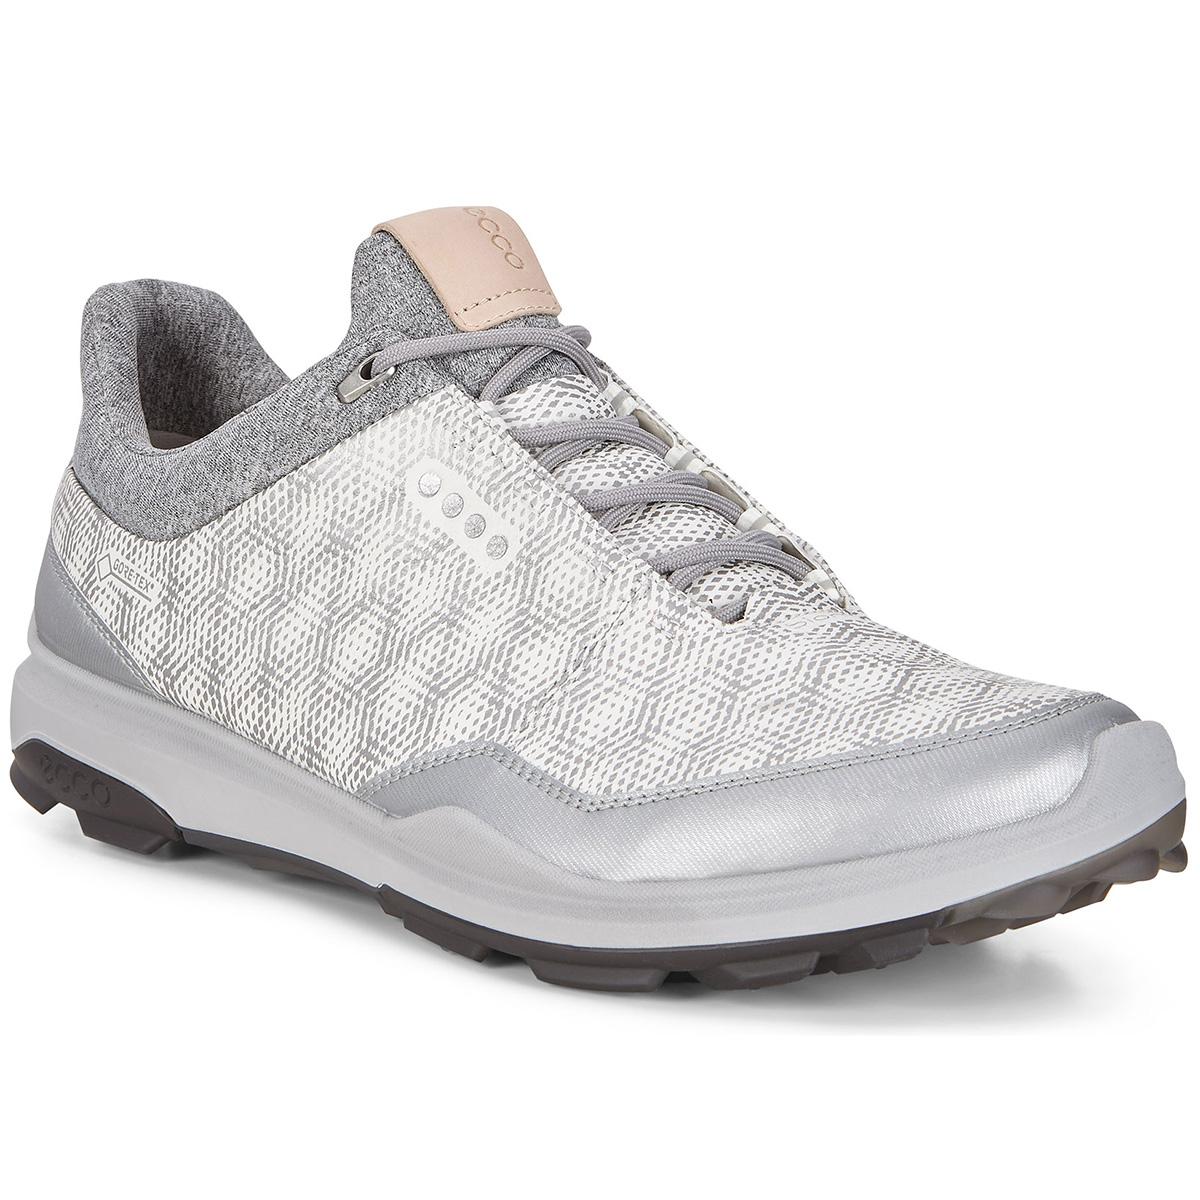 Ecco Biom Ladies Golf Shoes Uk